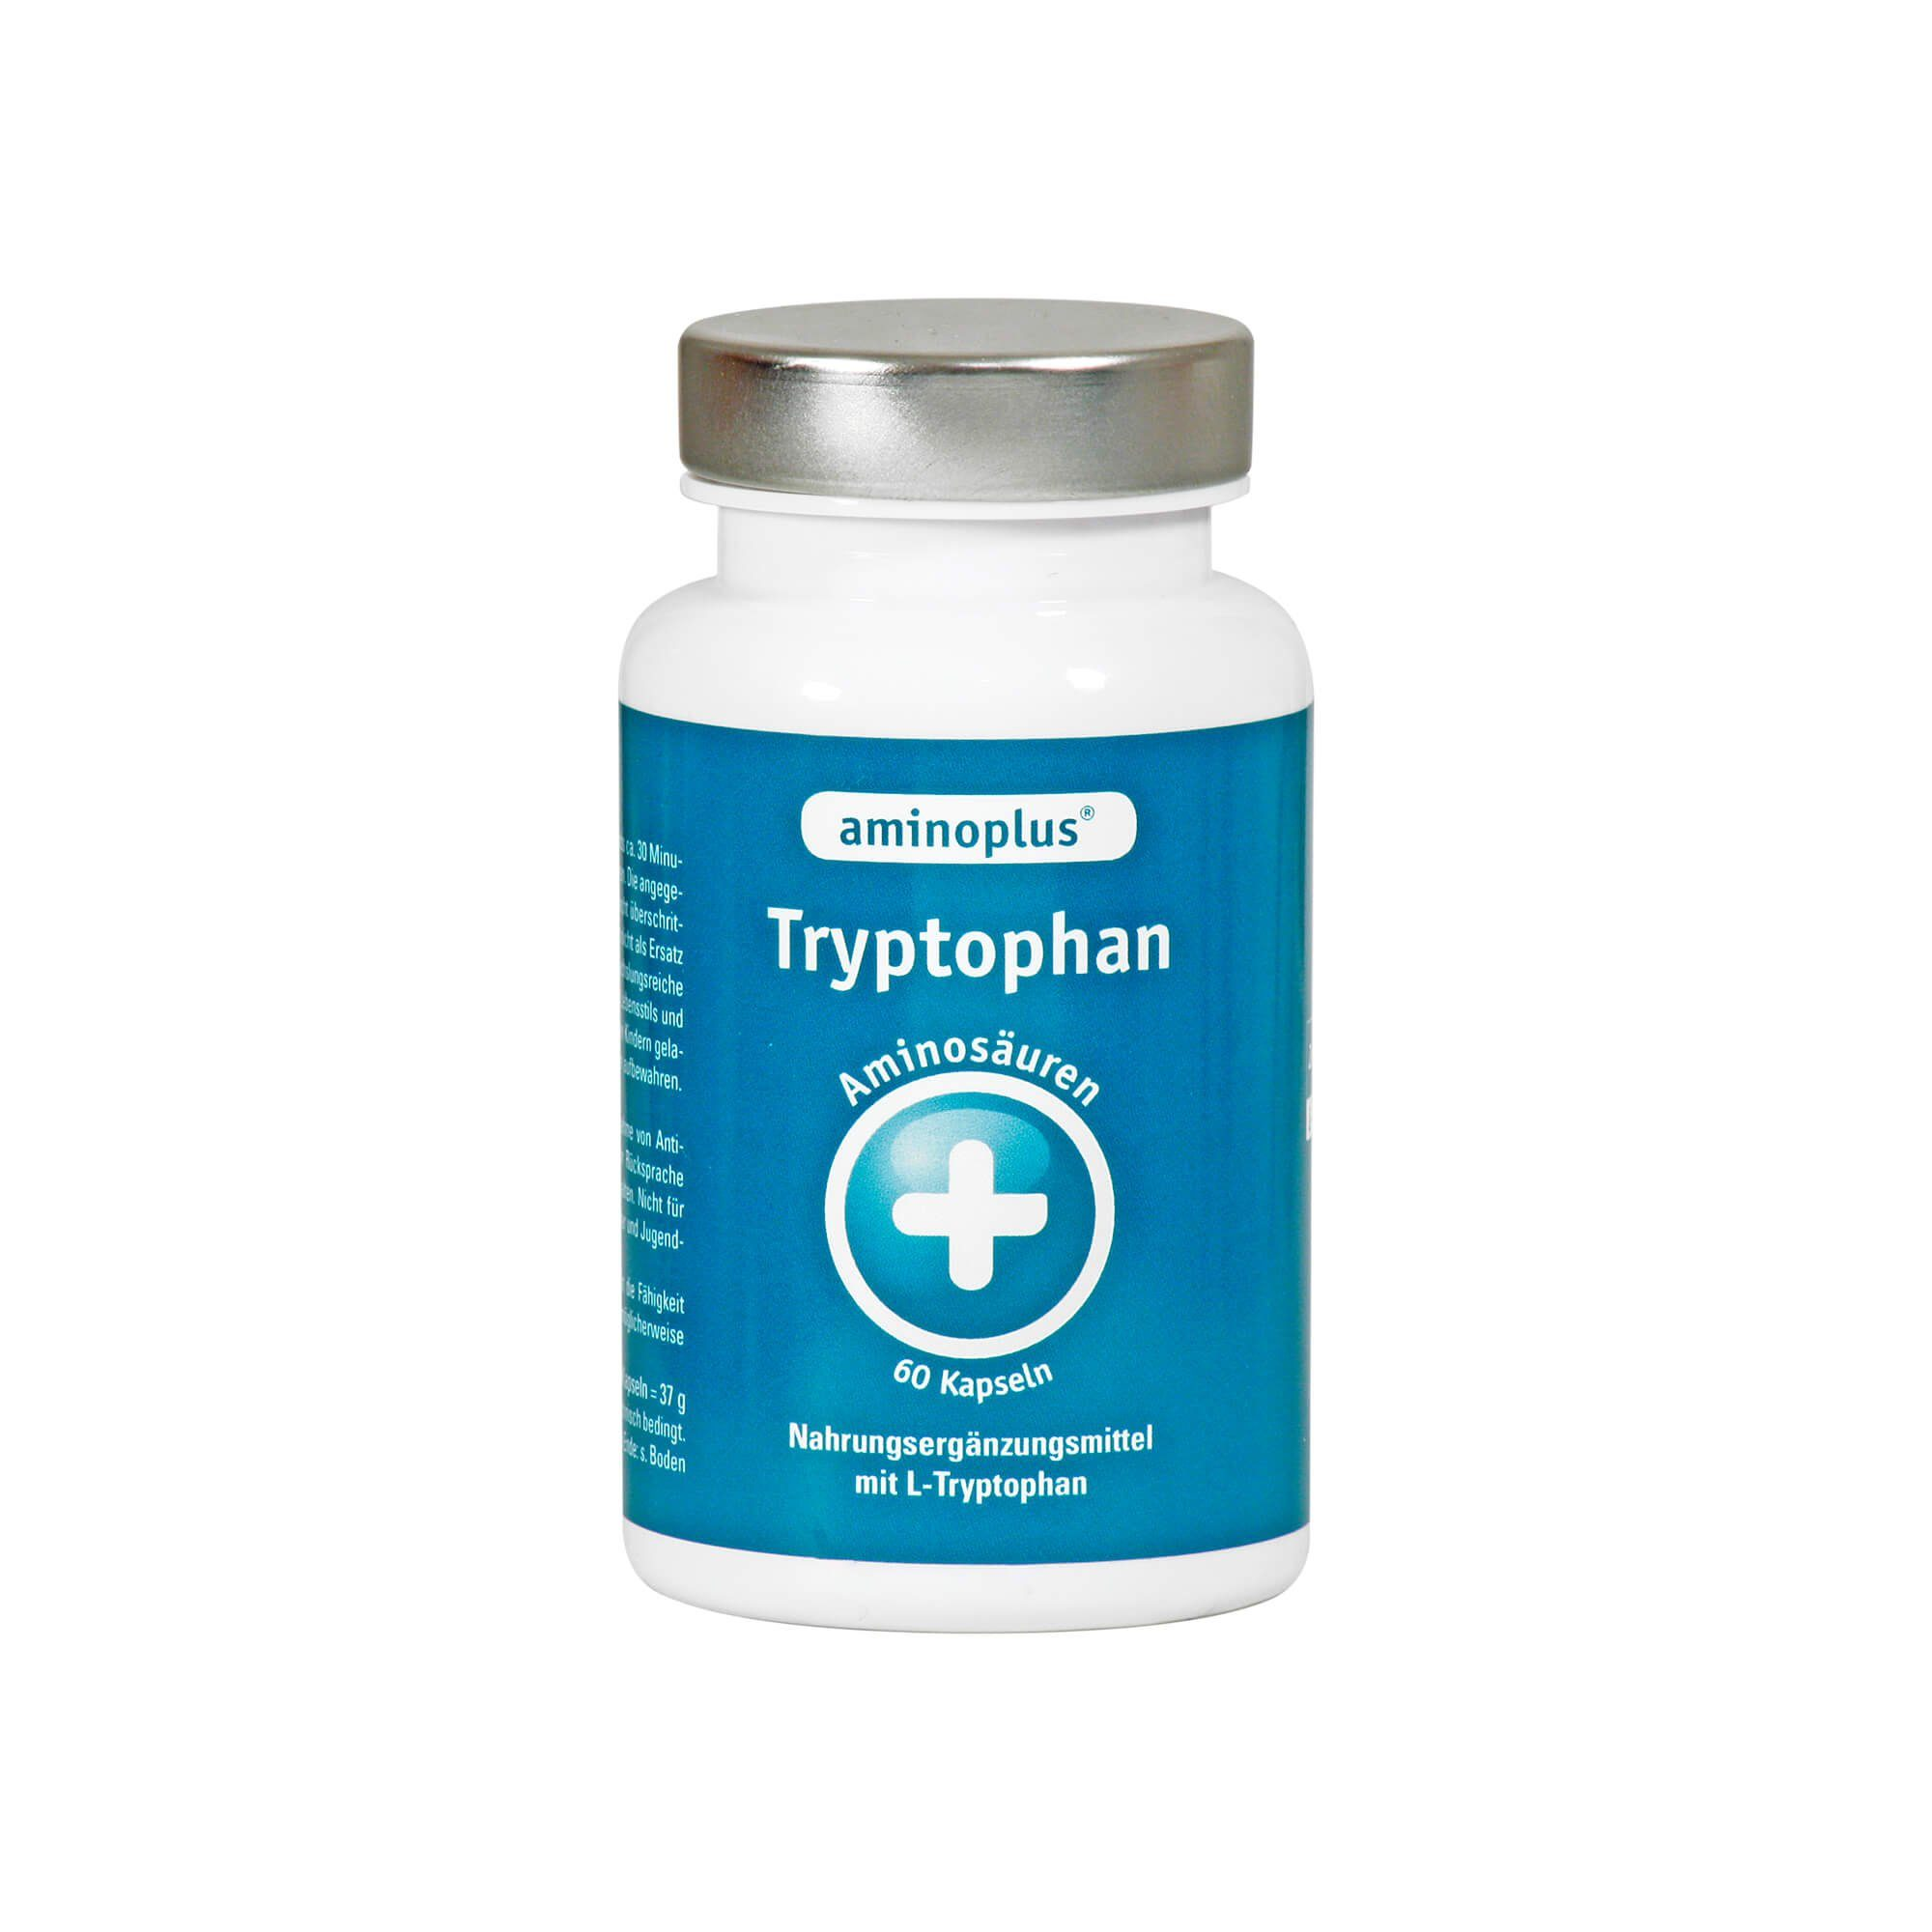 Aminoplus Tryptophan Kapseln, 60 St